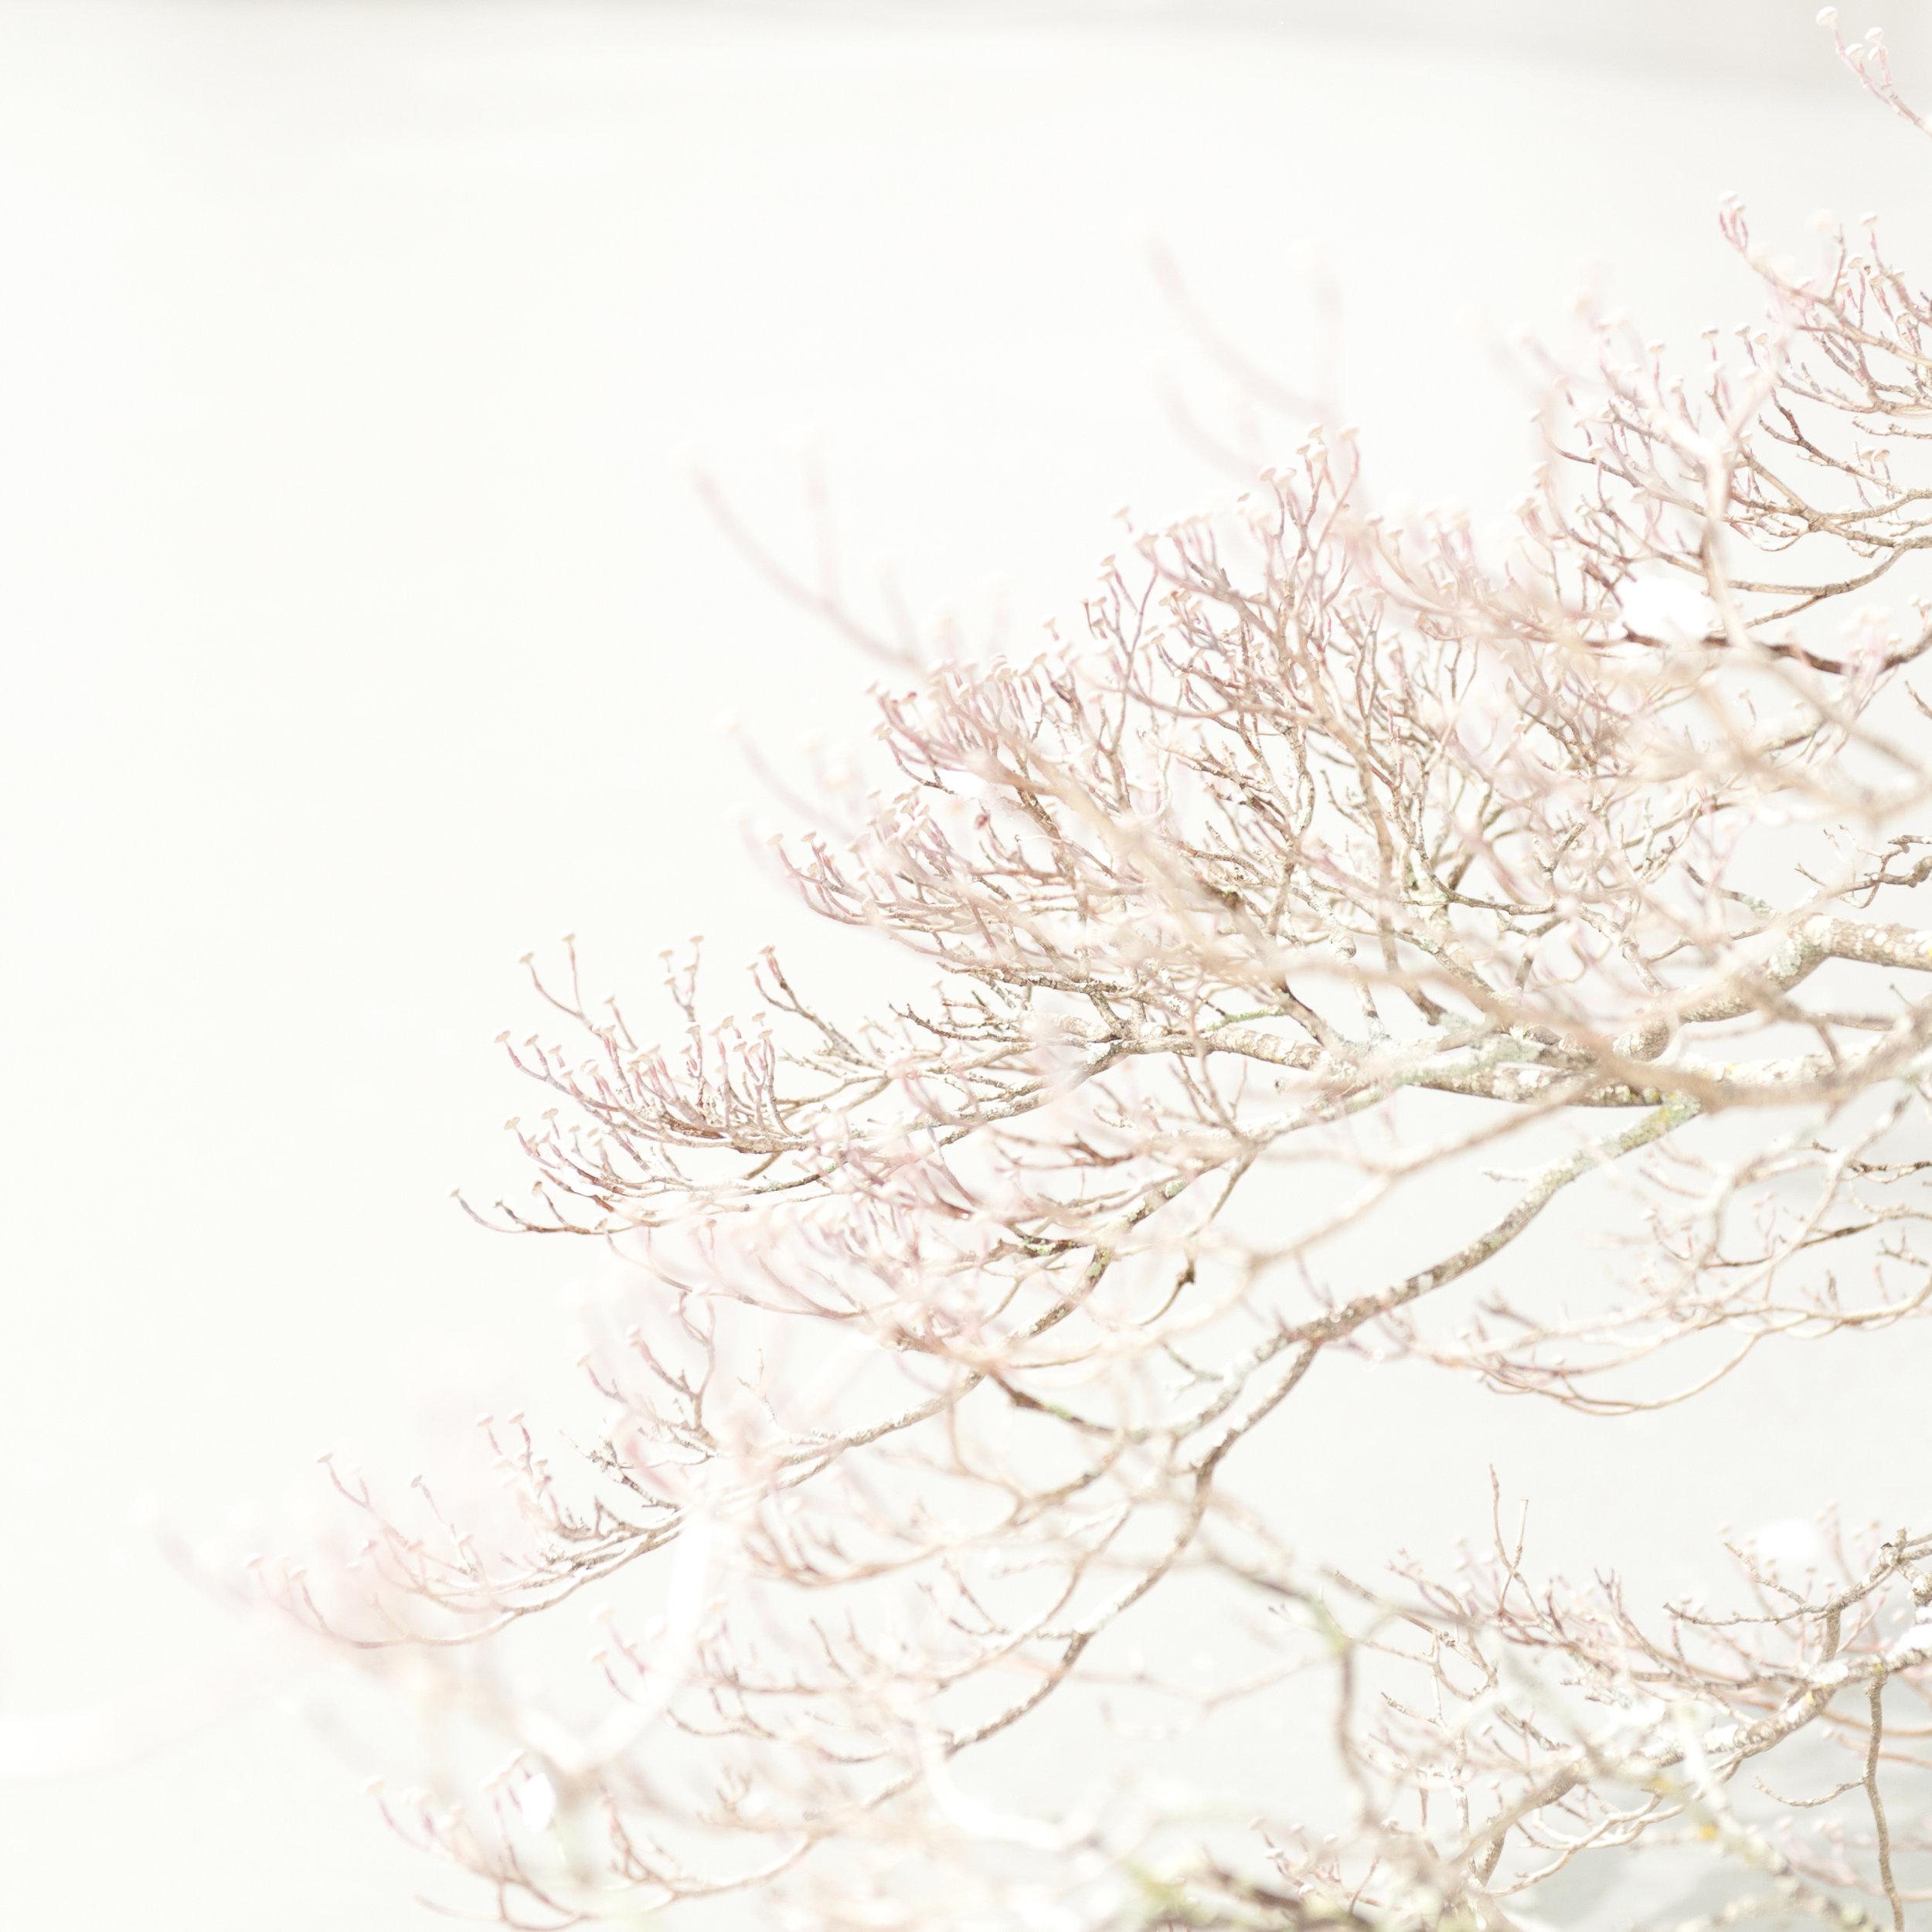 Study in Snow, Dogwood Tree, 11